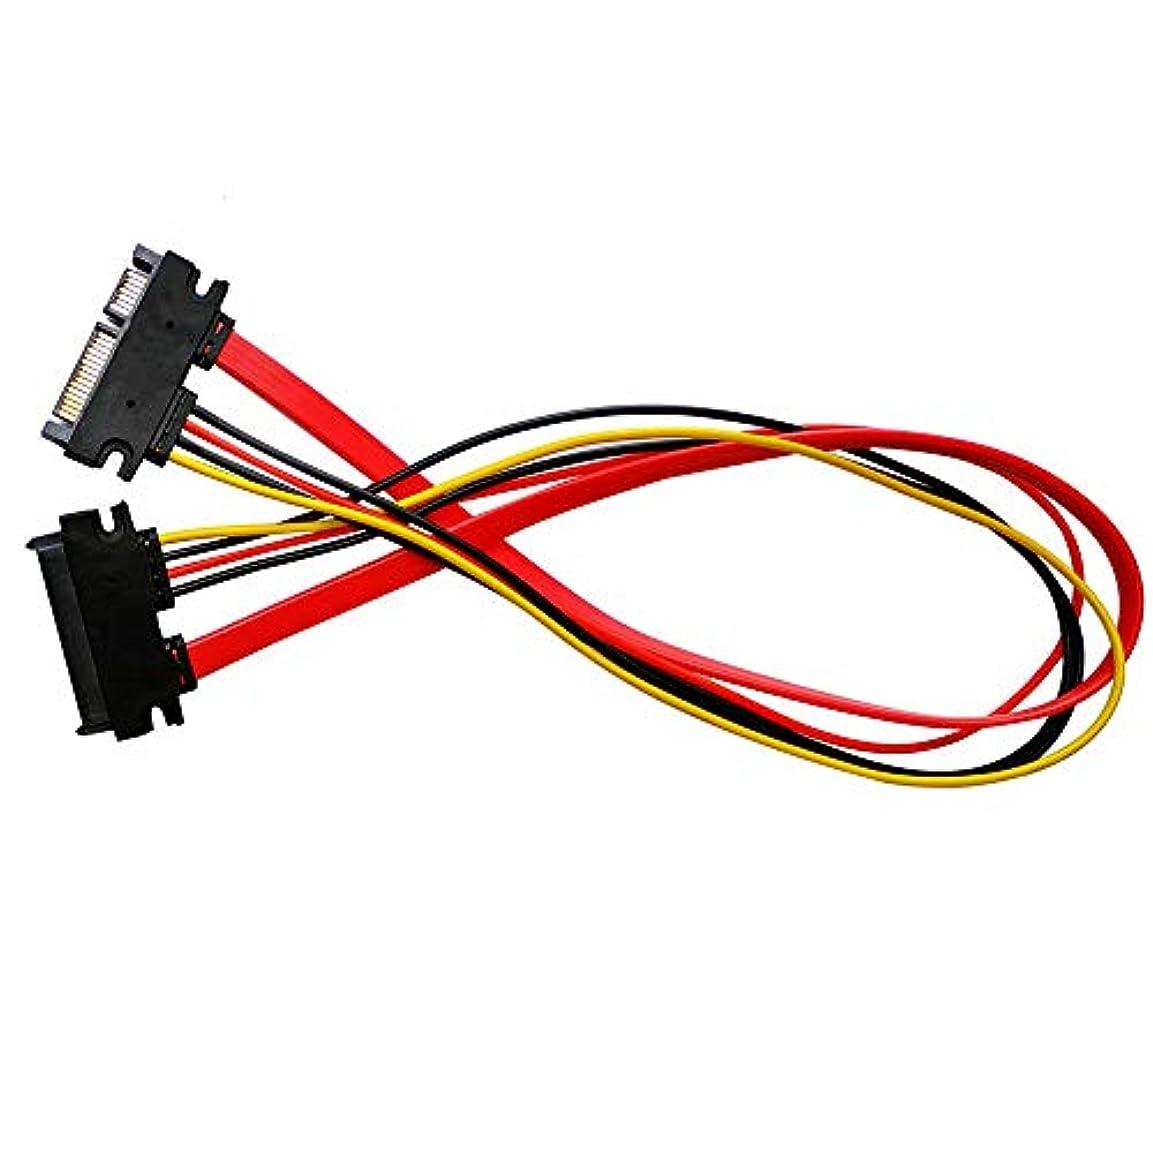 "10pcs 8/"" Inch 15-pin SATA Male to 6-pin PCI-E PCI Express Power Adapter Cable"